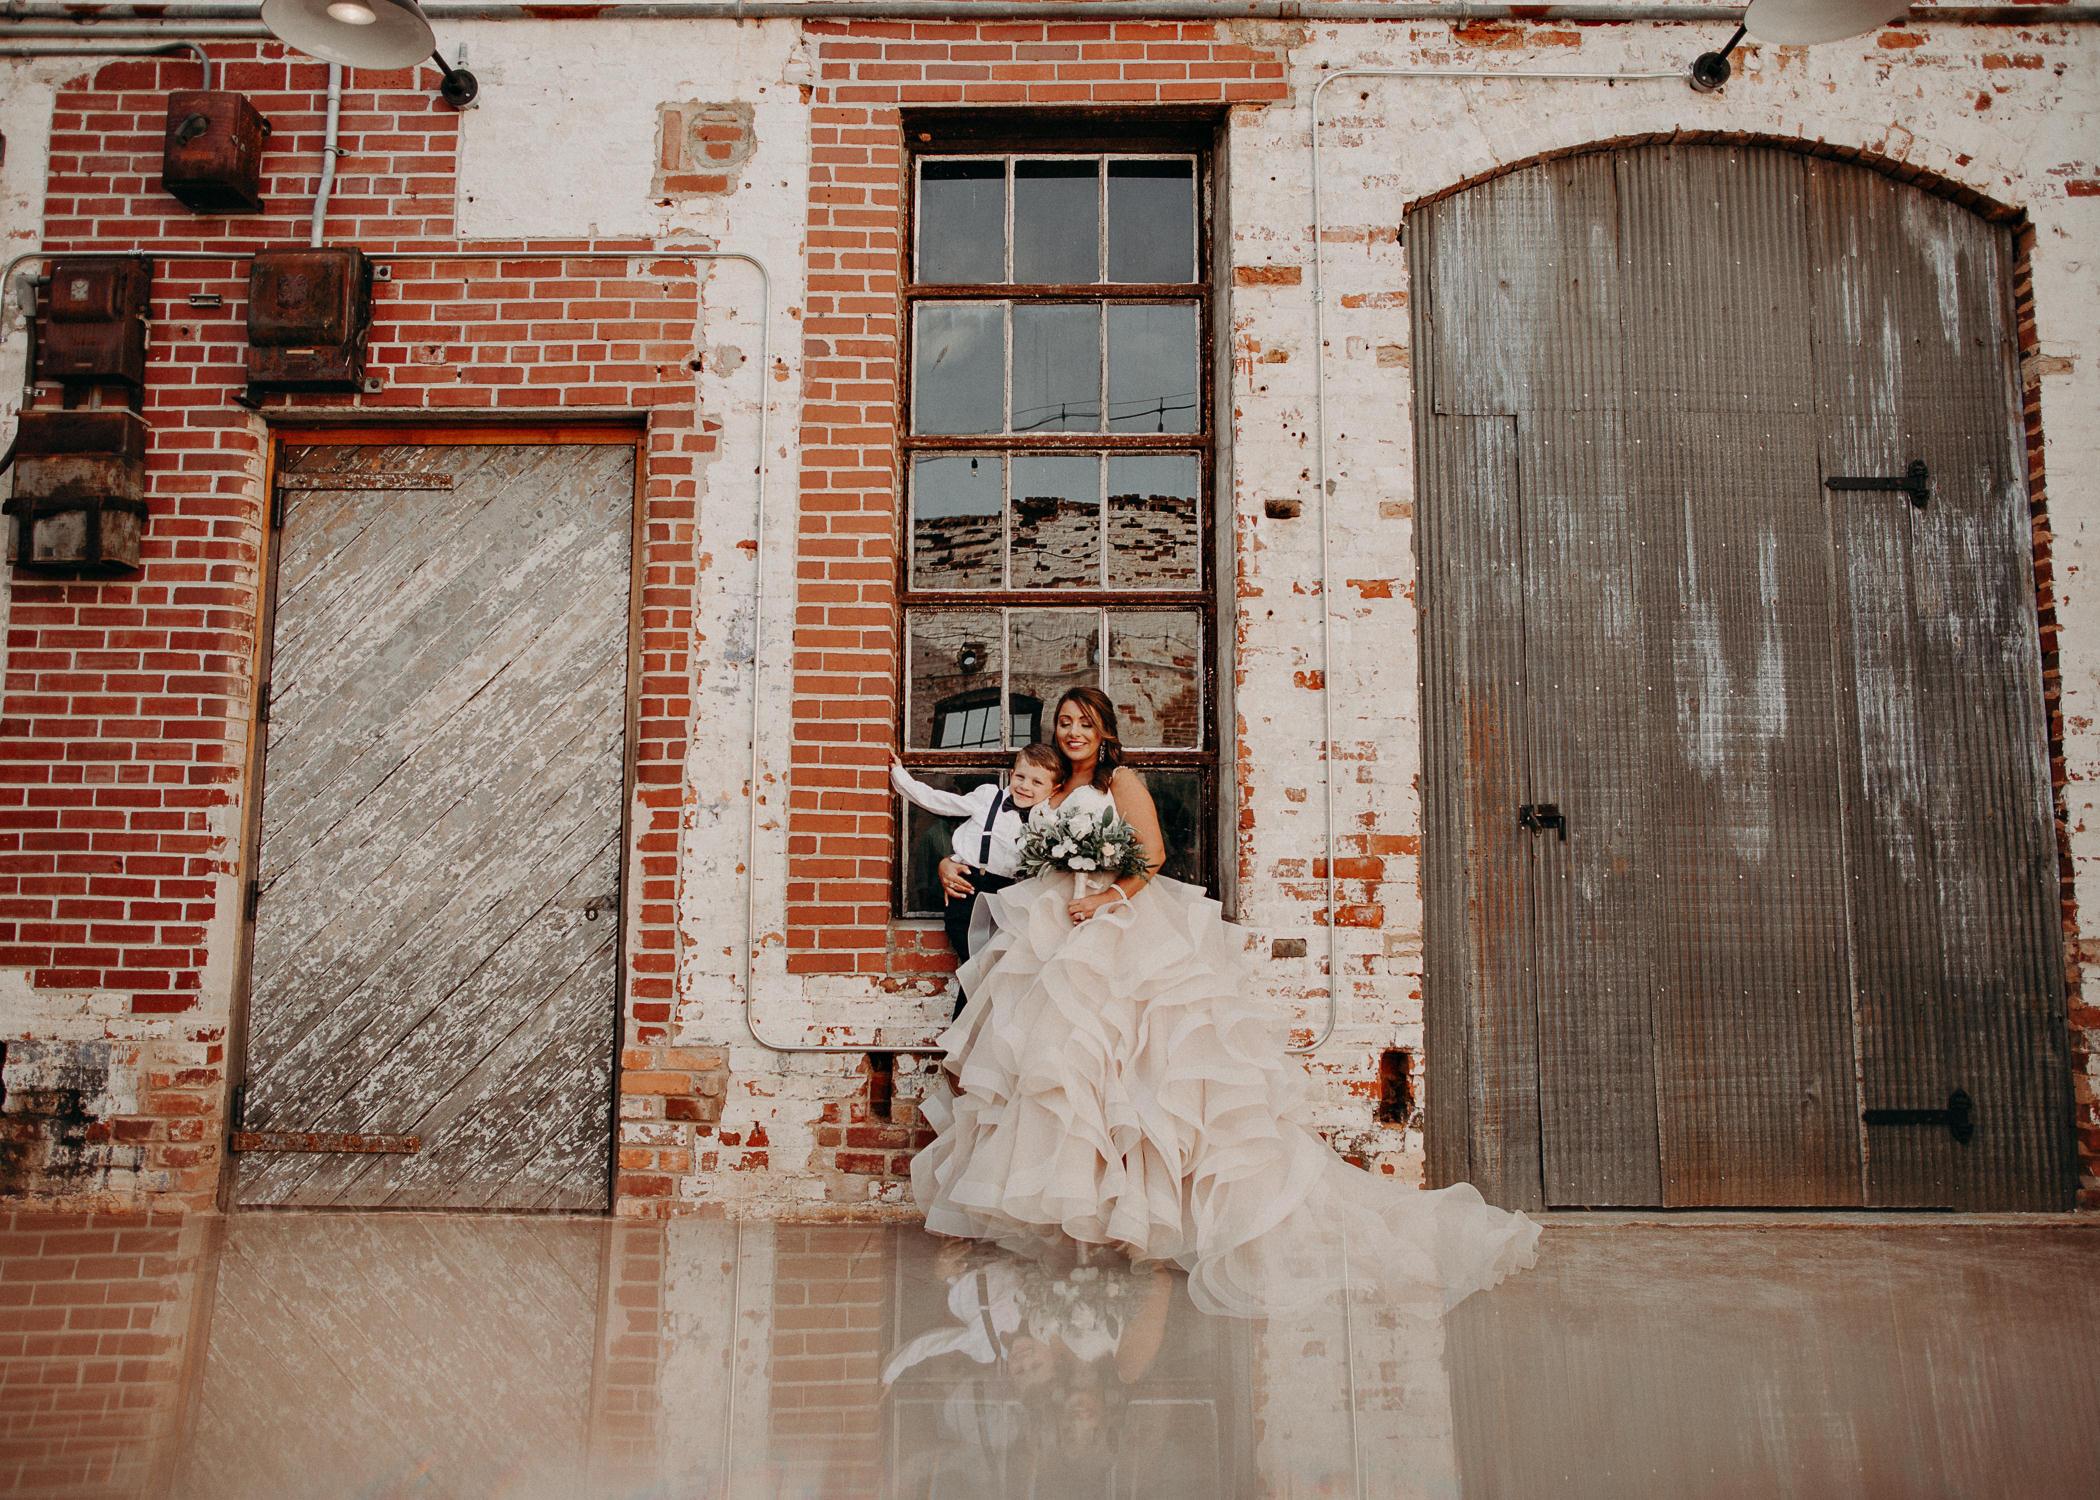 31 4 - Atlanta Wedding Photographer - The engine room - Ga - Wedding trends - Aline Marin Photography.jpg